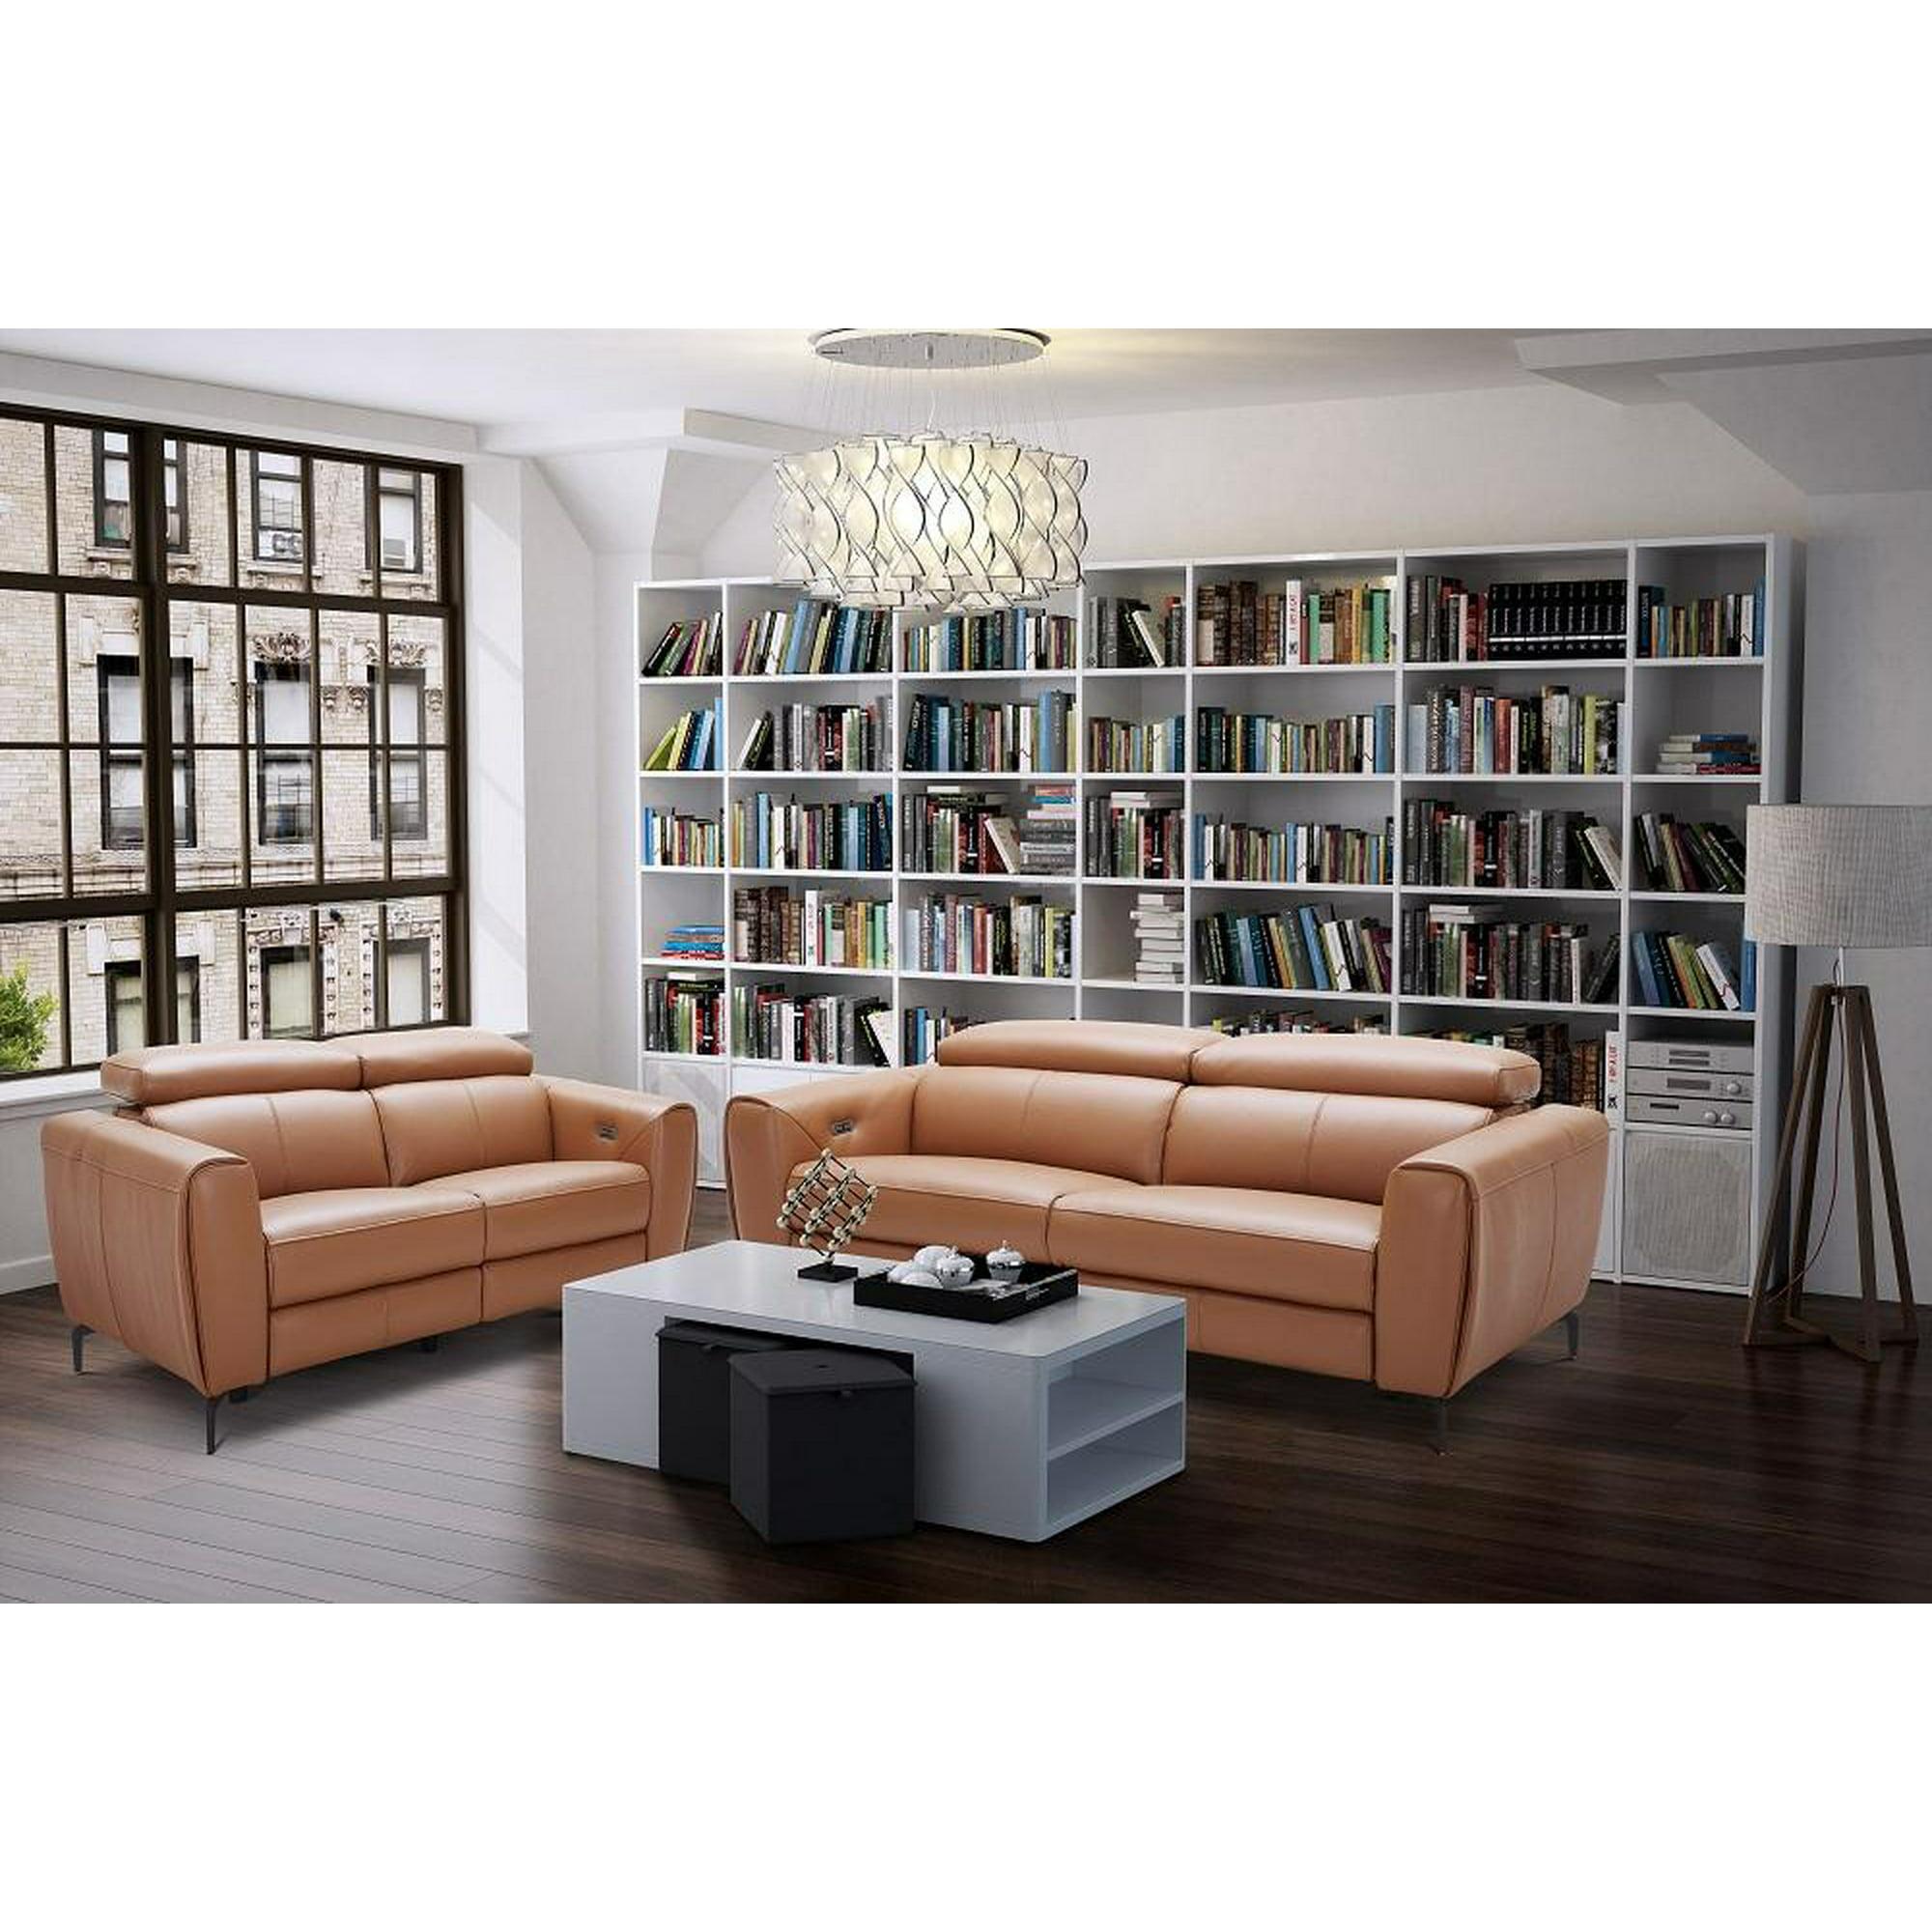 Modern Motion Living Room Sofa Set in Caramel 6Pcs J&M Lorenzo - Walmart.com